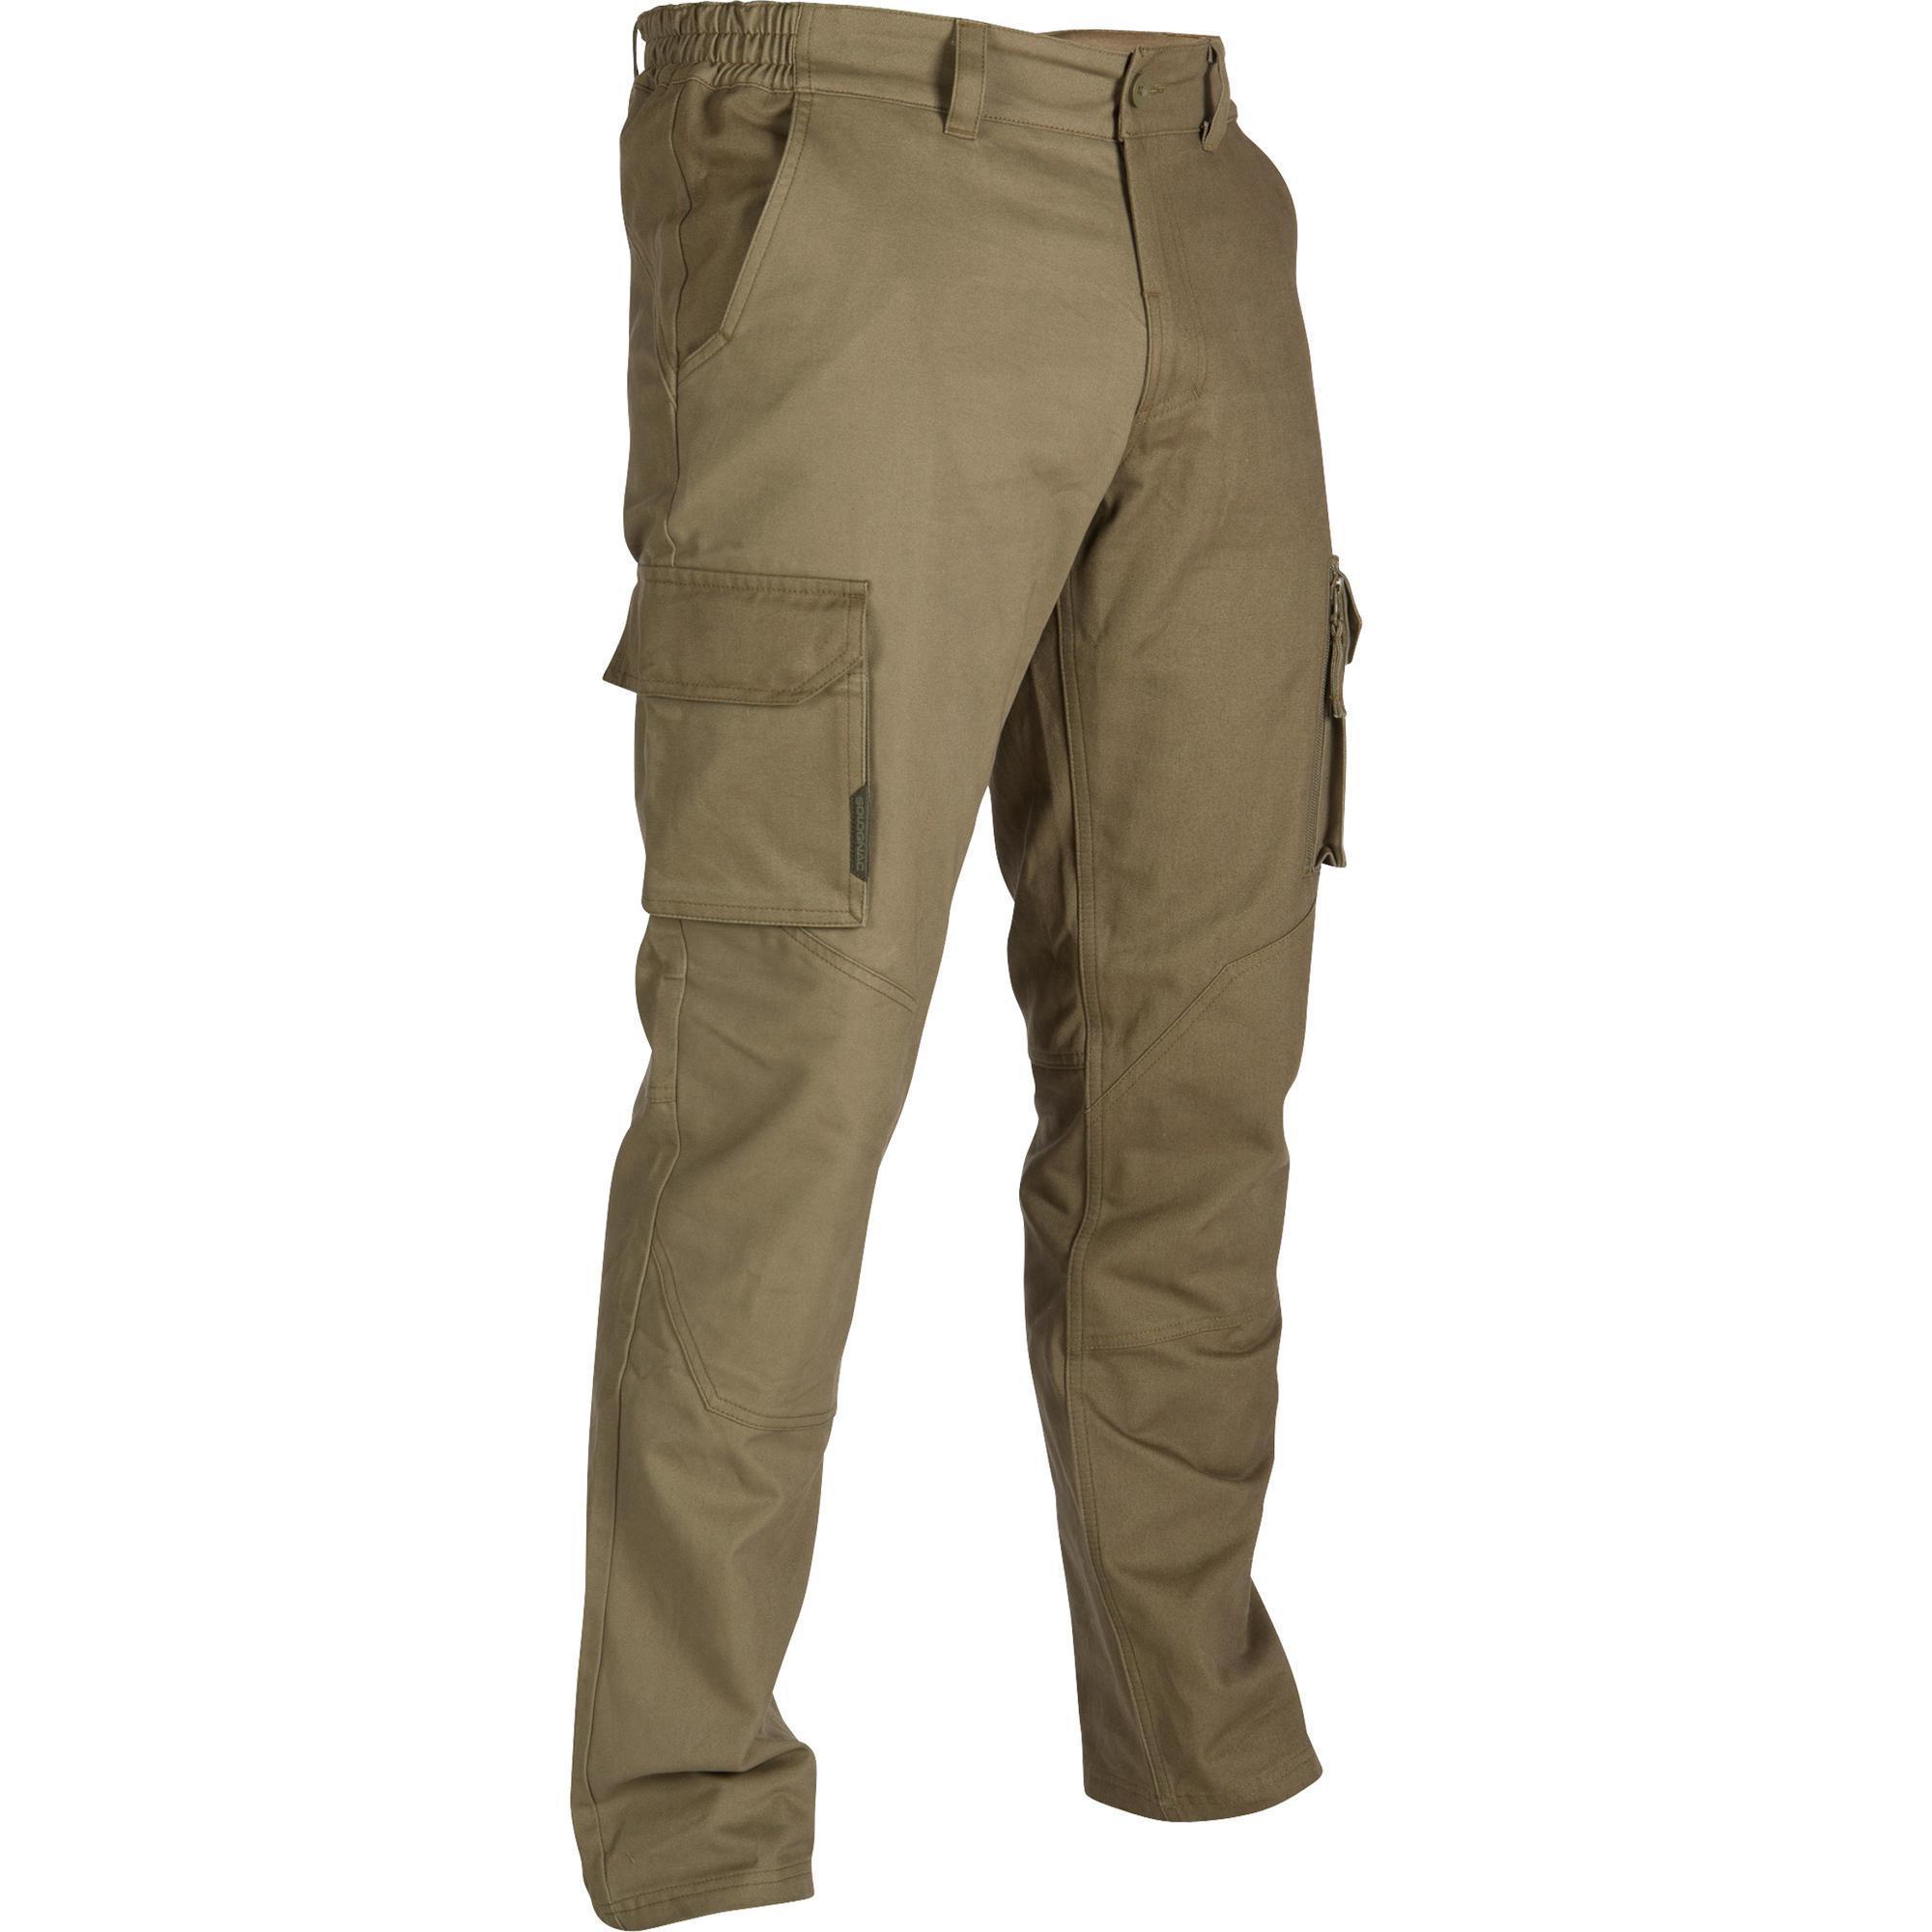 Solognac Pantalon chasse 520 vert - Solognac